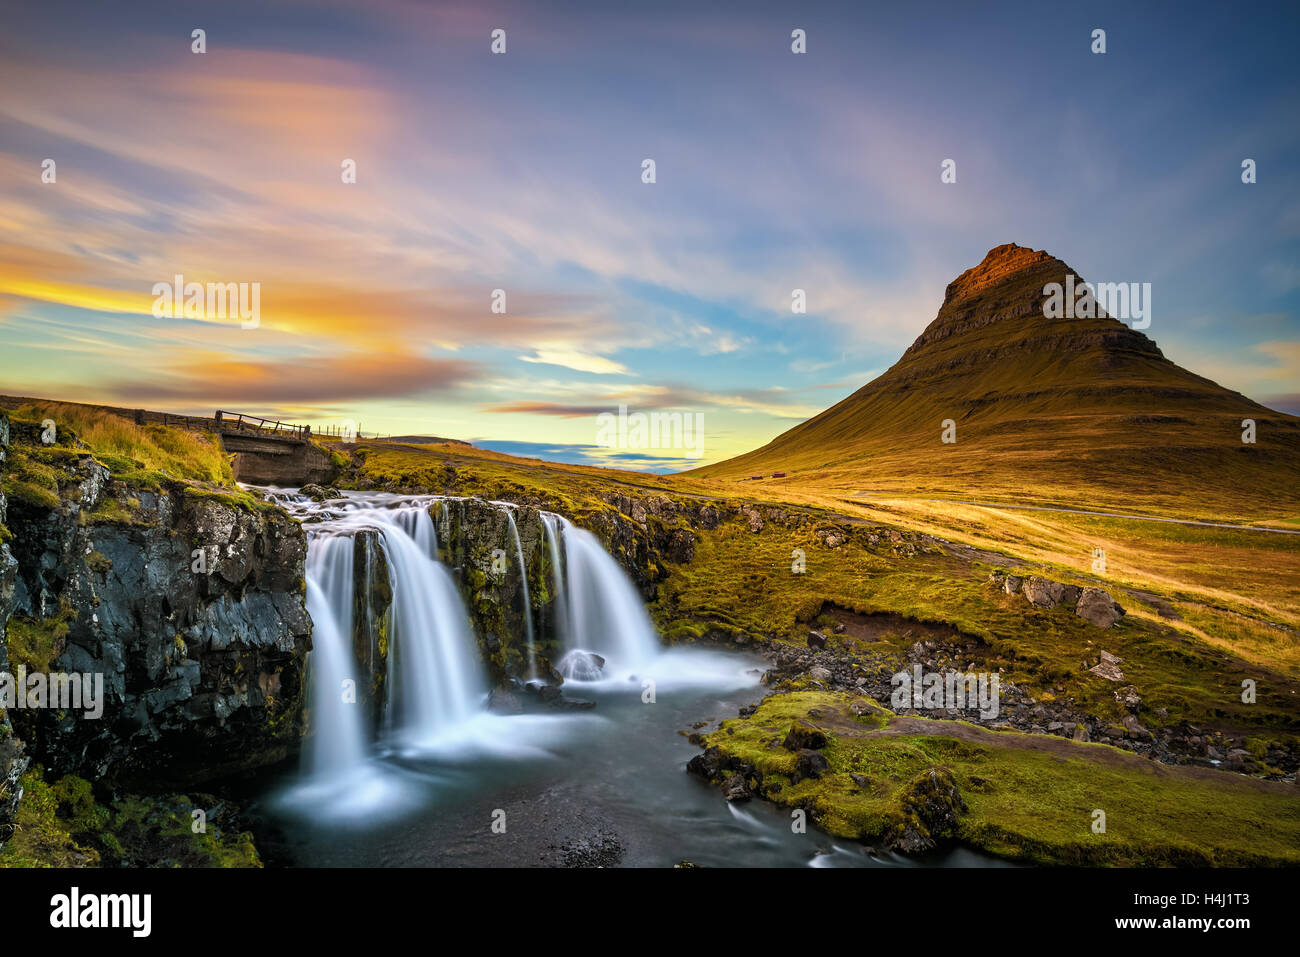 Verano atardecer en la famosa montaña Kirkjufell Kirkjufellsfoss cascada con en el fondo en Islandia. La larga exposición. Foto de stock